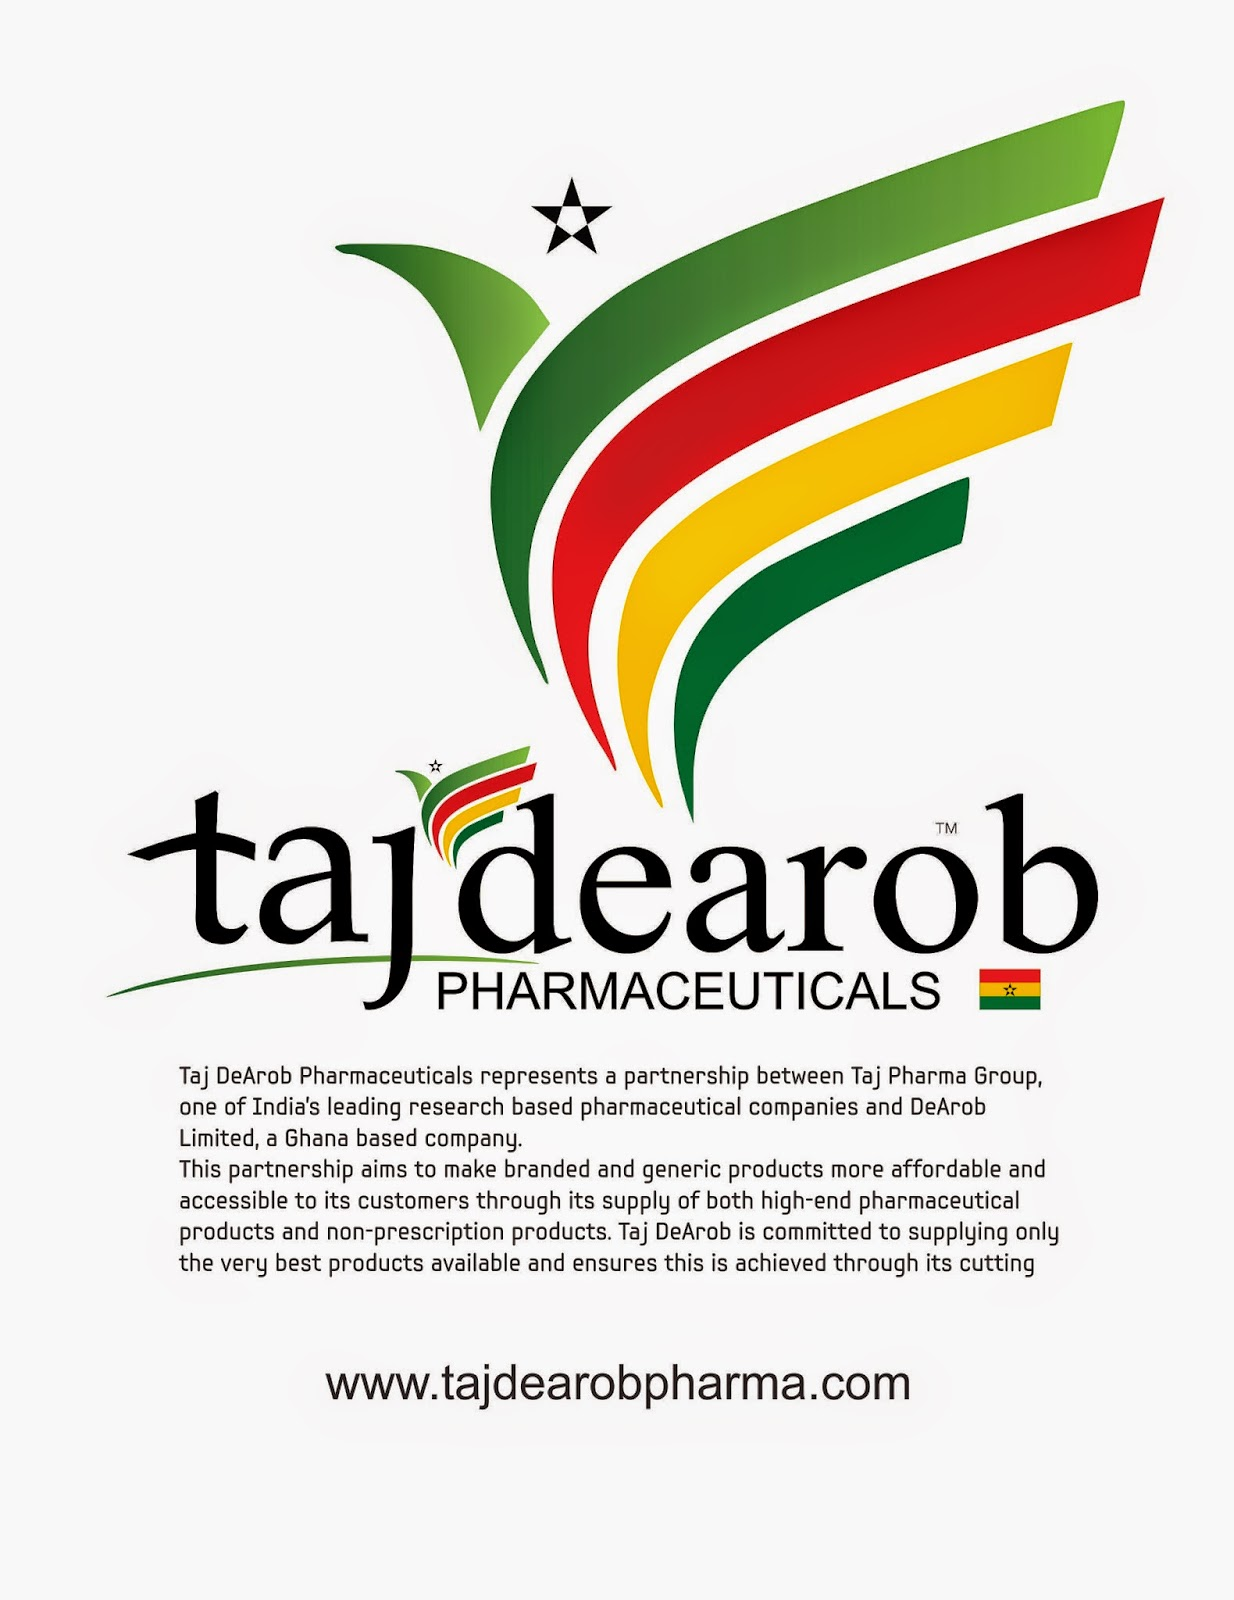 Taj DeArob Pharmaceuticals represents a partnership between Taj